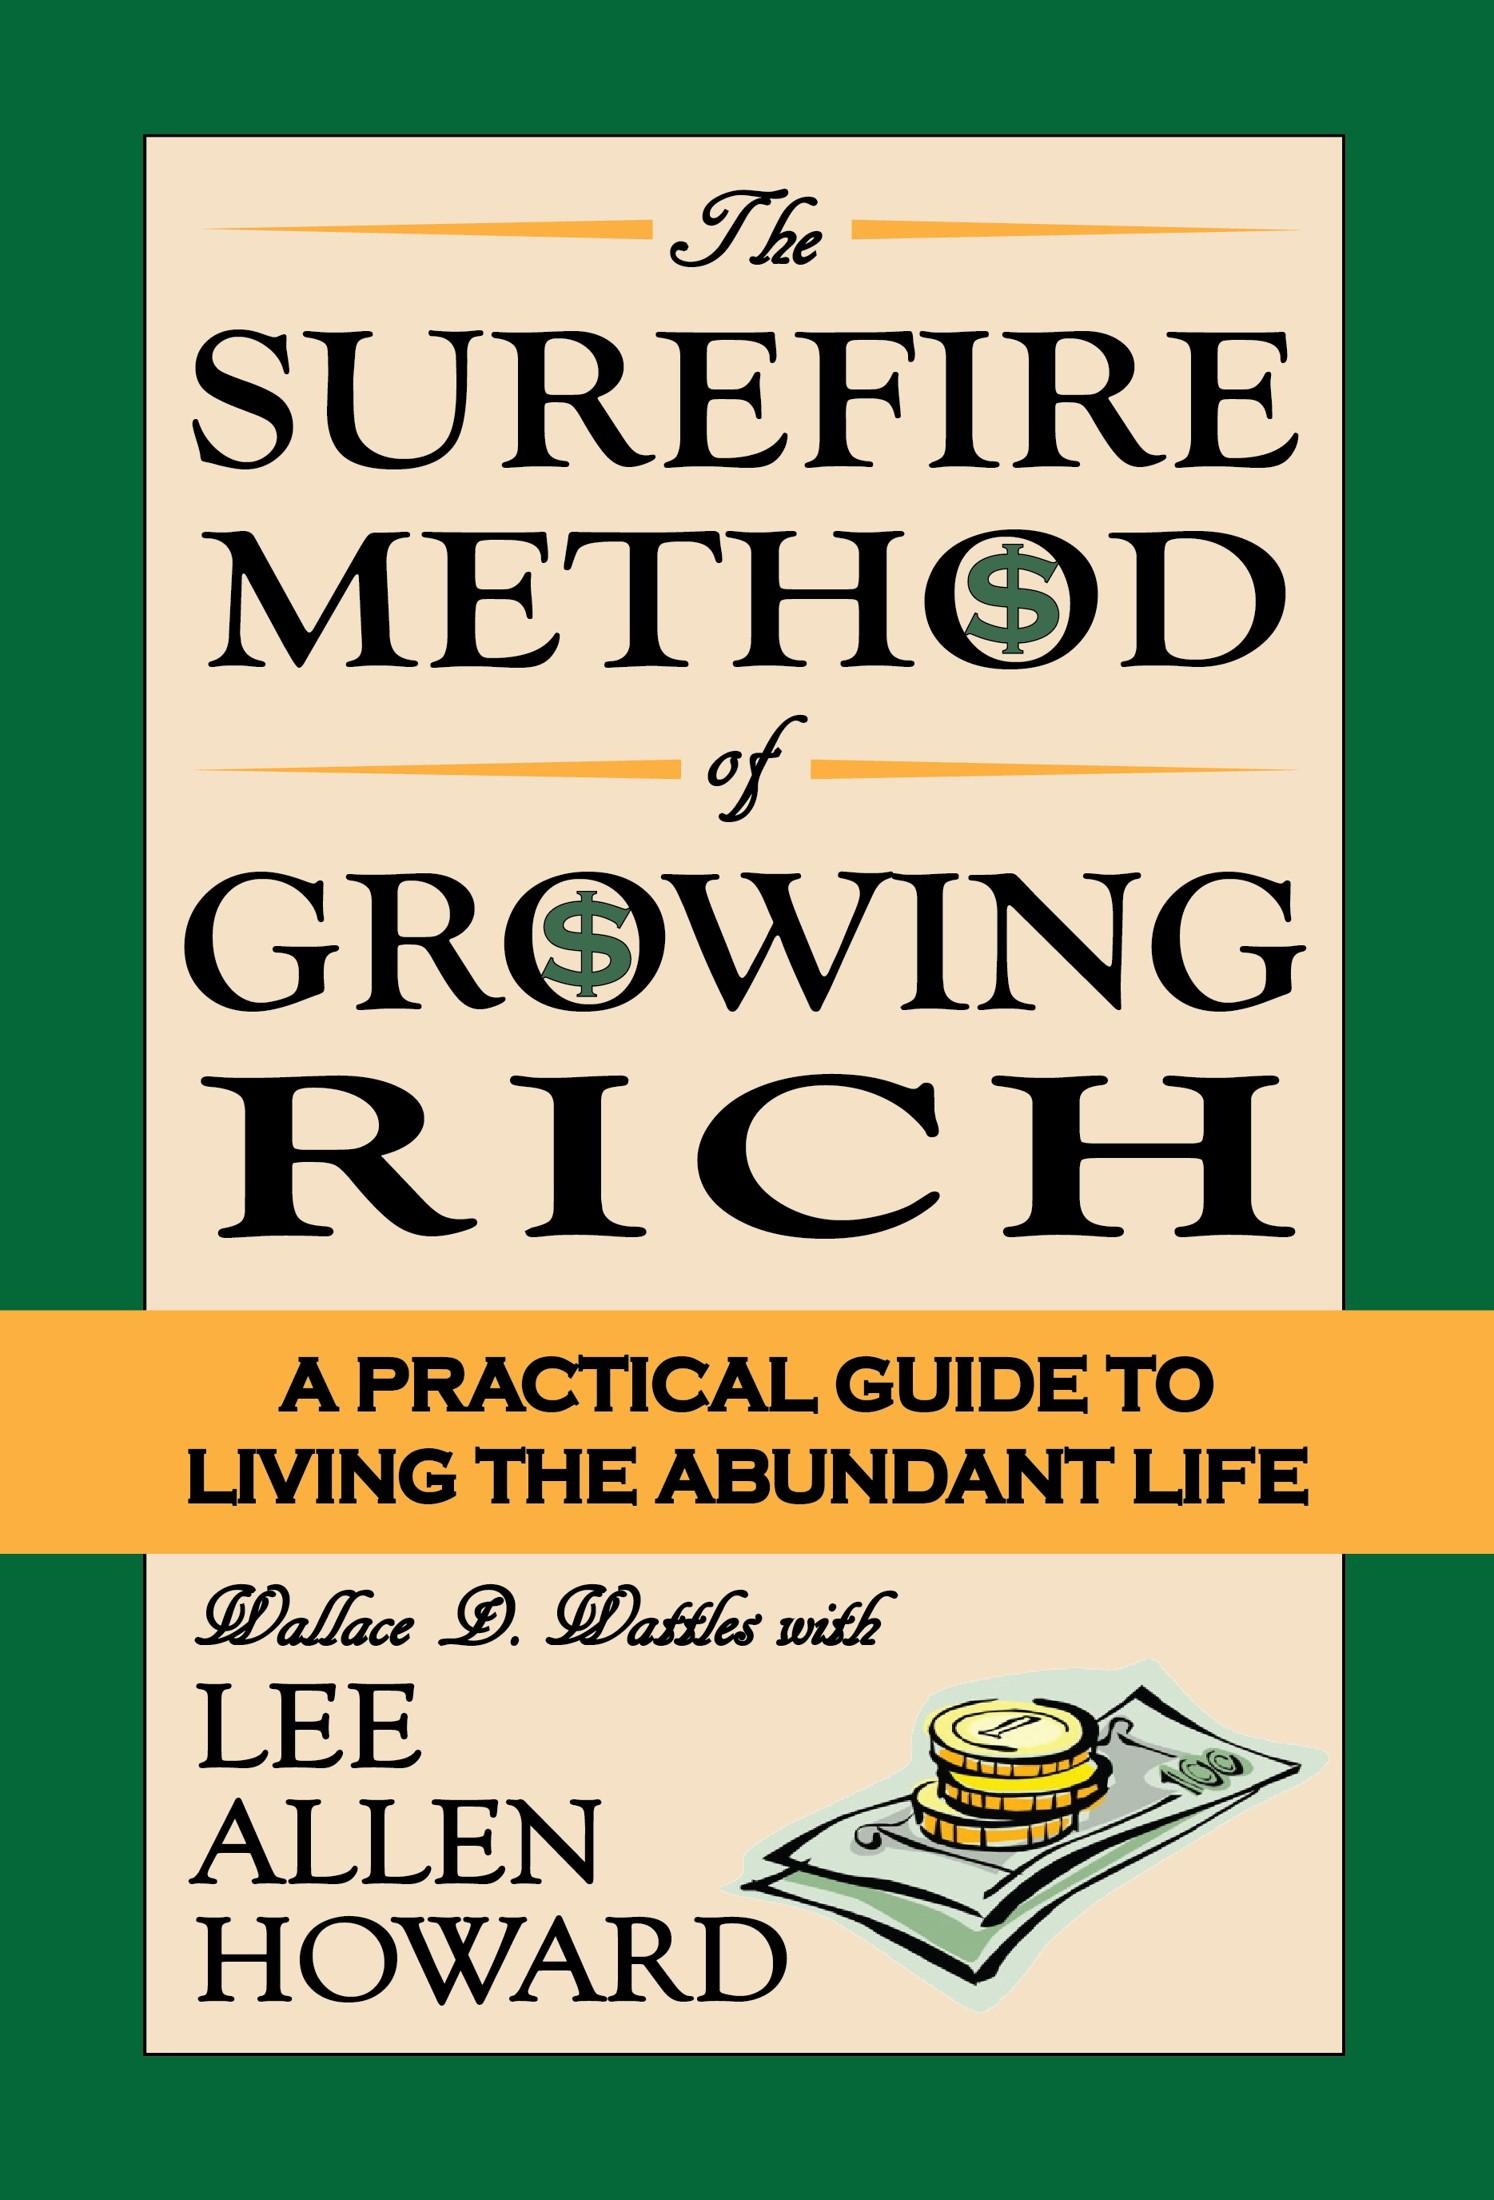 The Surefire Method of Growing Rich